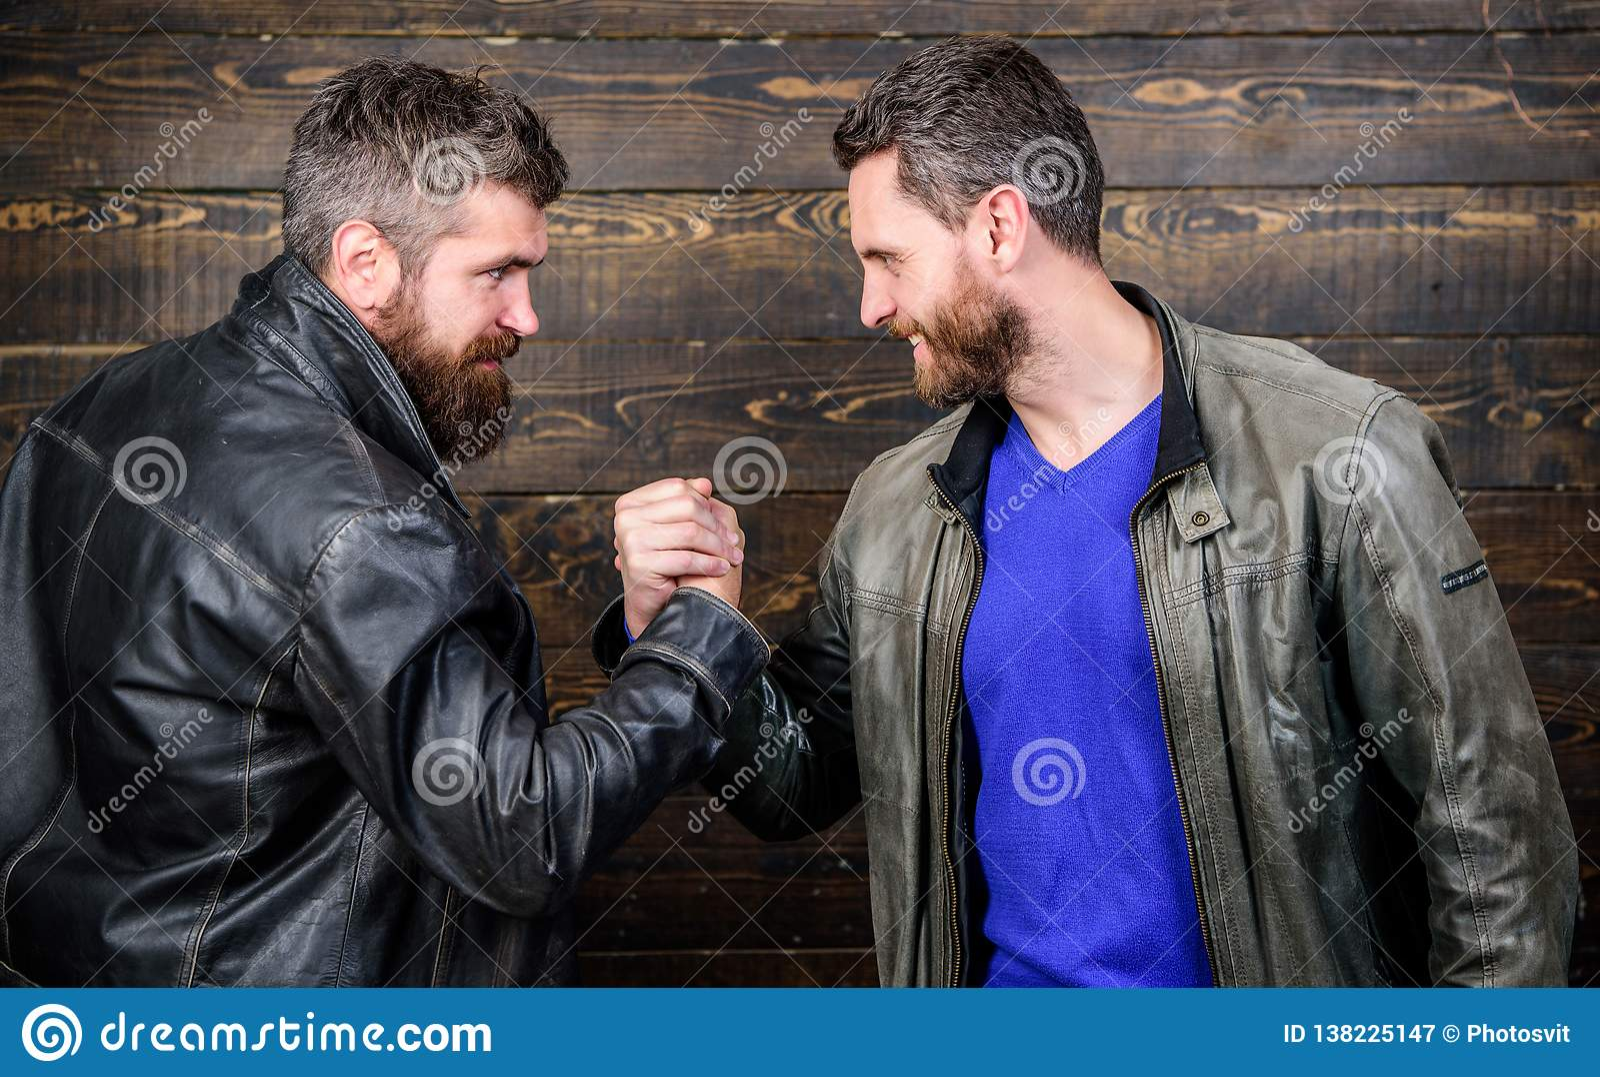 Strong handshake. Friendship of brutal guys. Handshake symbol of successful deal. Approved business deal. Handshake